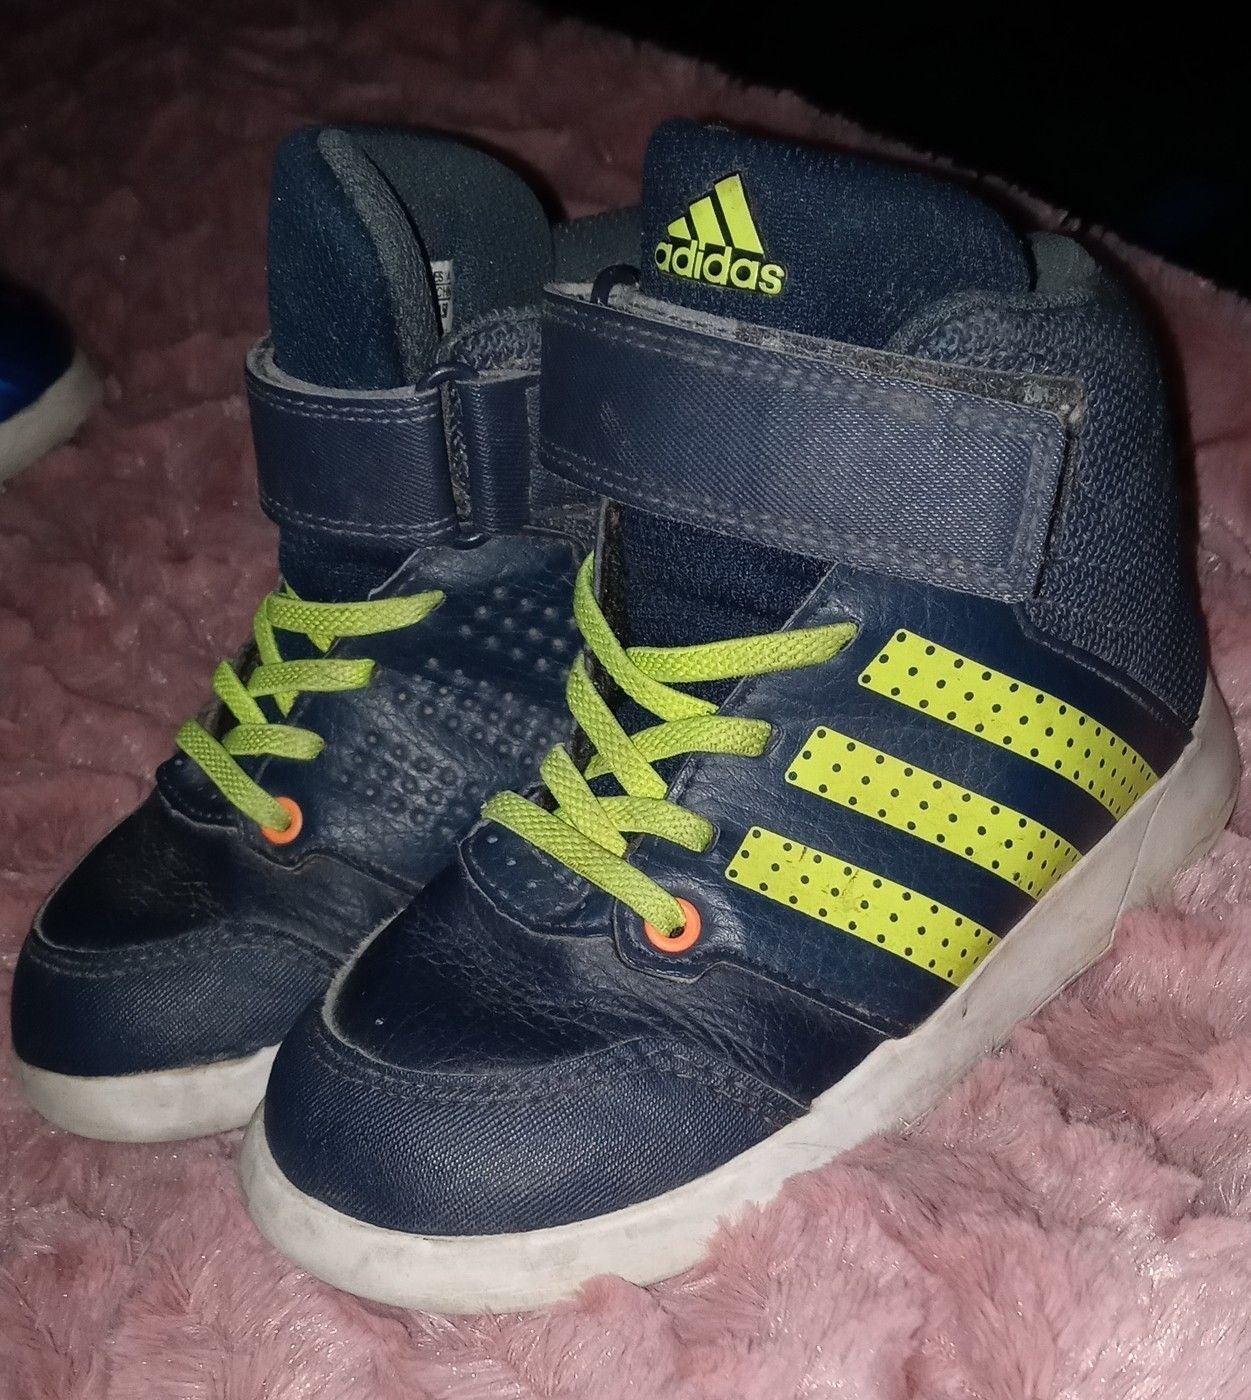 Adidas high top sneakers